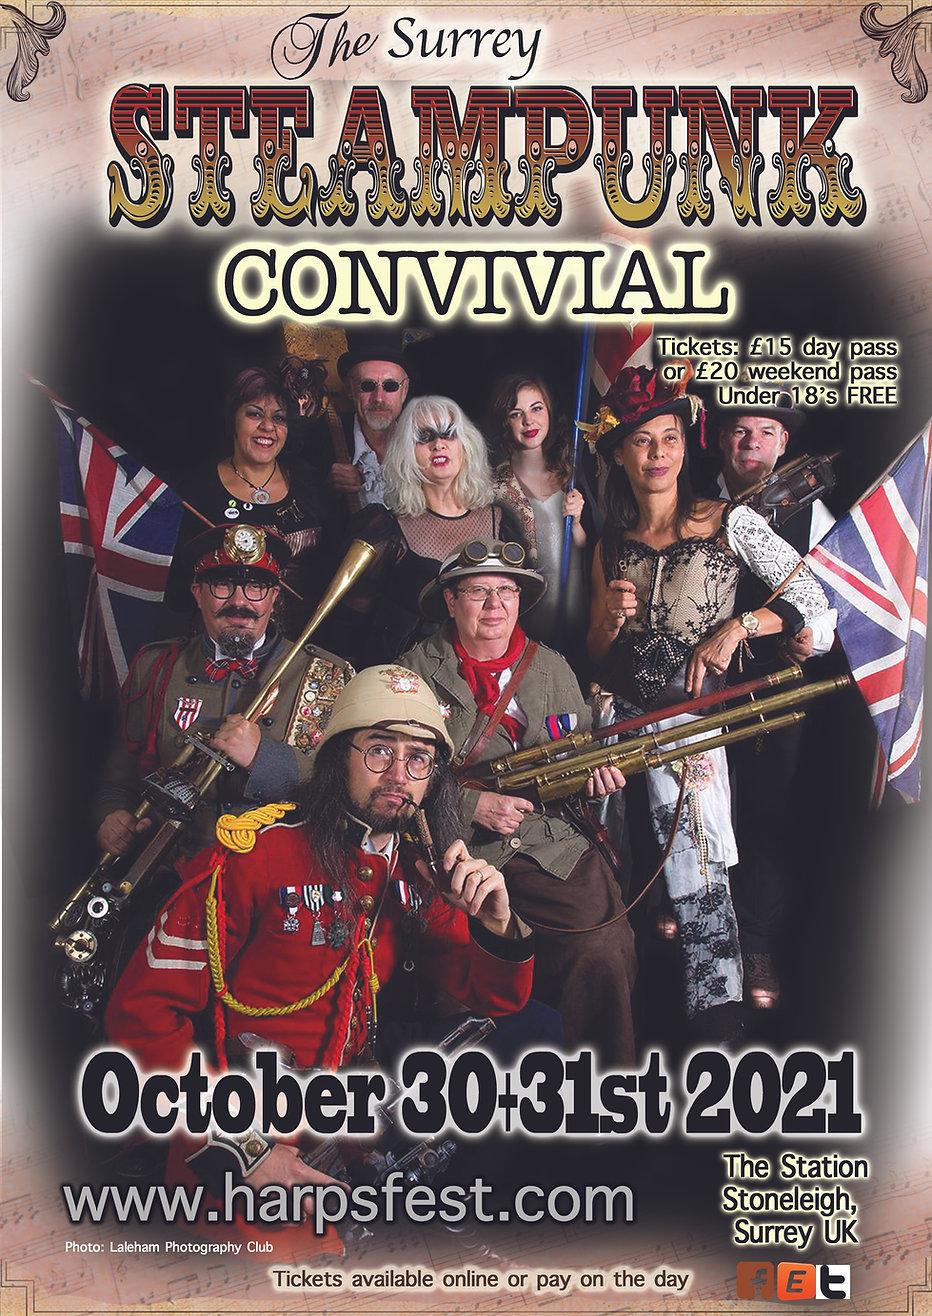 Steampunk Convivial Poster oct 2021.jpg